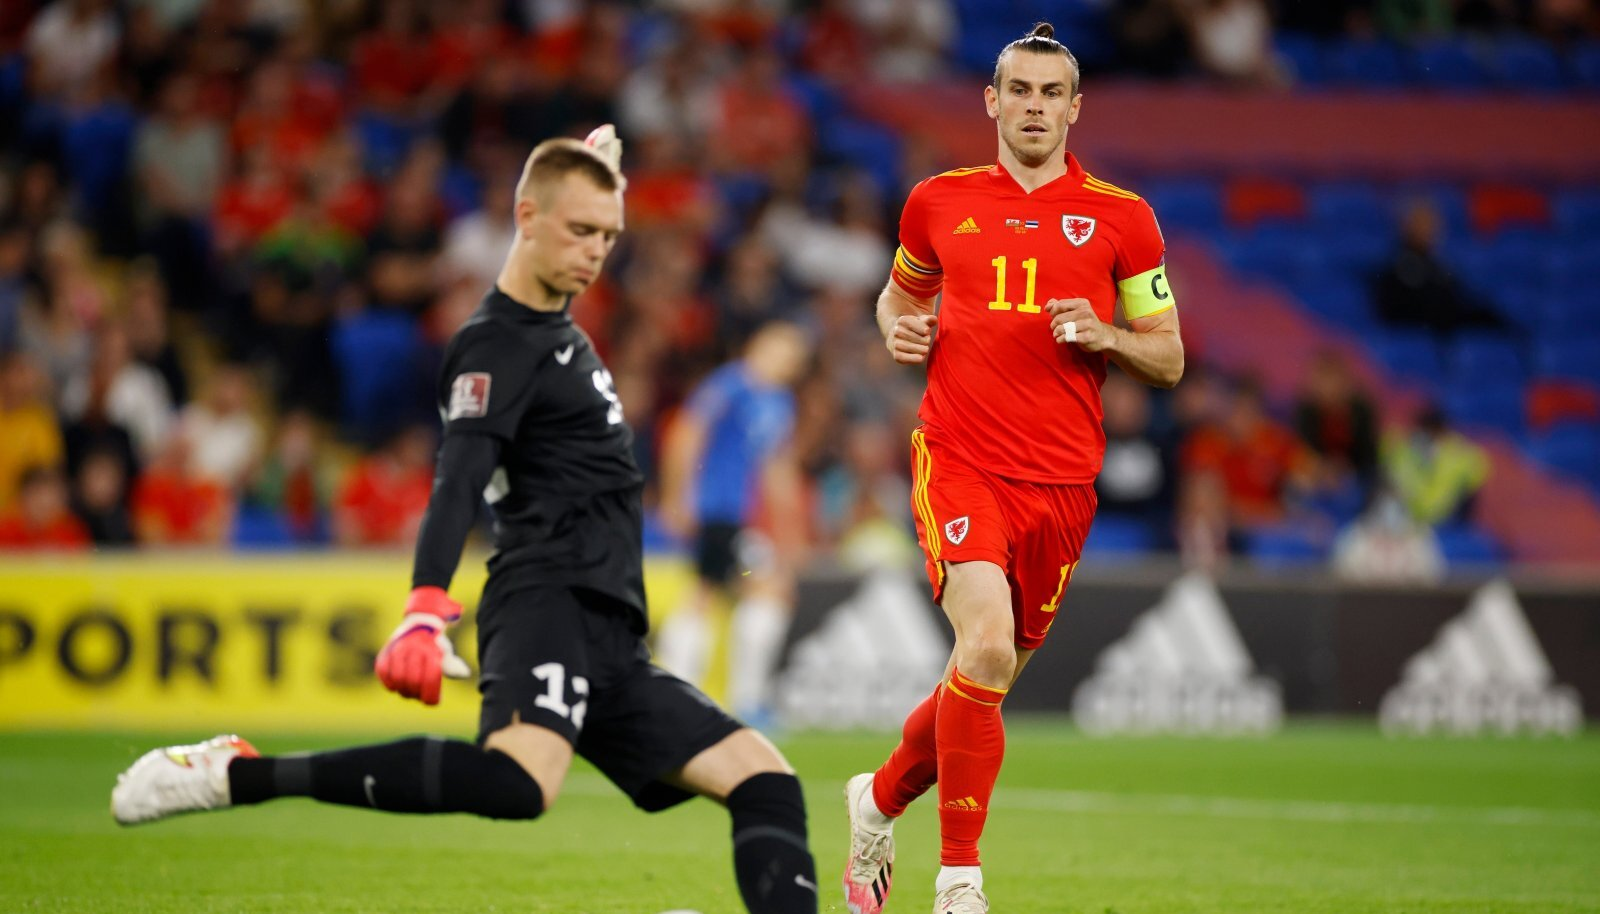 Gareth Bale jälgimas Karl Jakob Heina tegemisi.